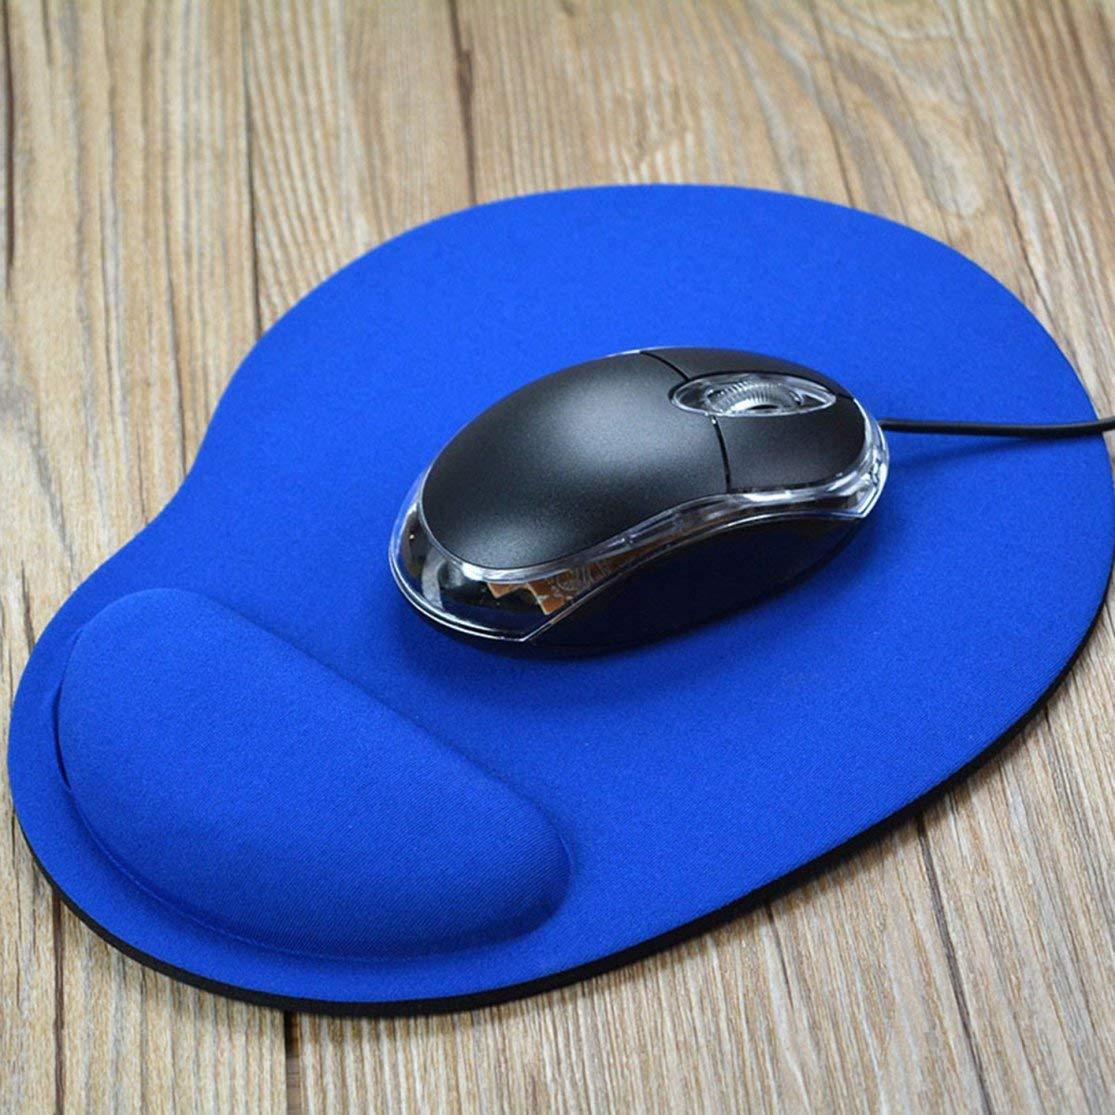 LouiseEvel215 Ergonomic Mouse Pad with Wrist Support Rest Soft EVA Mouse Mat for Laptop Desktop Anti-Slip Mice Mat